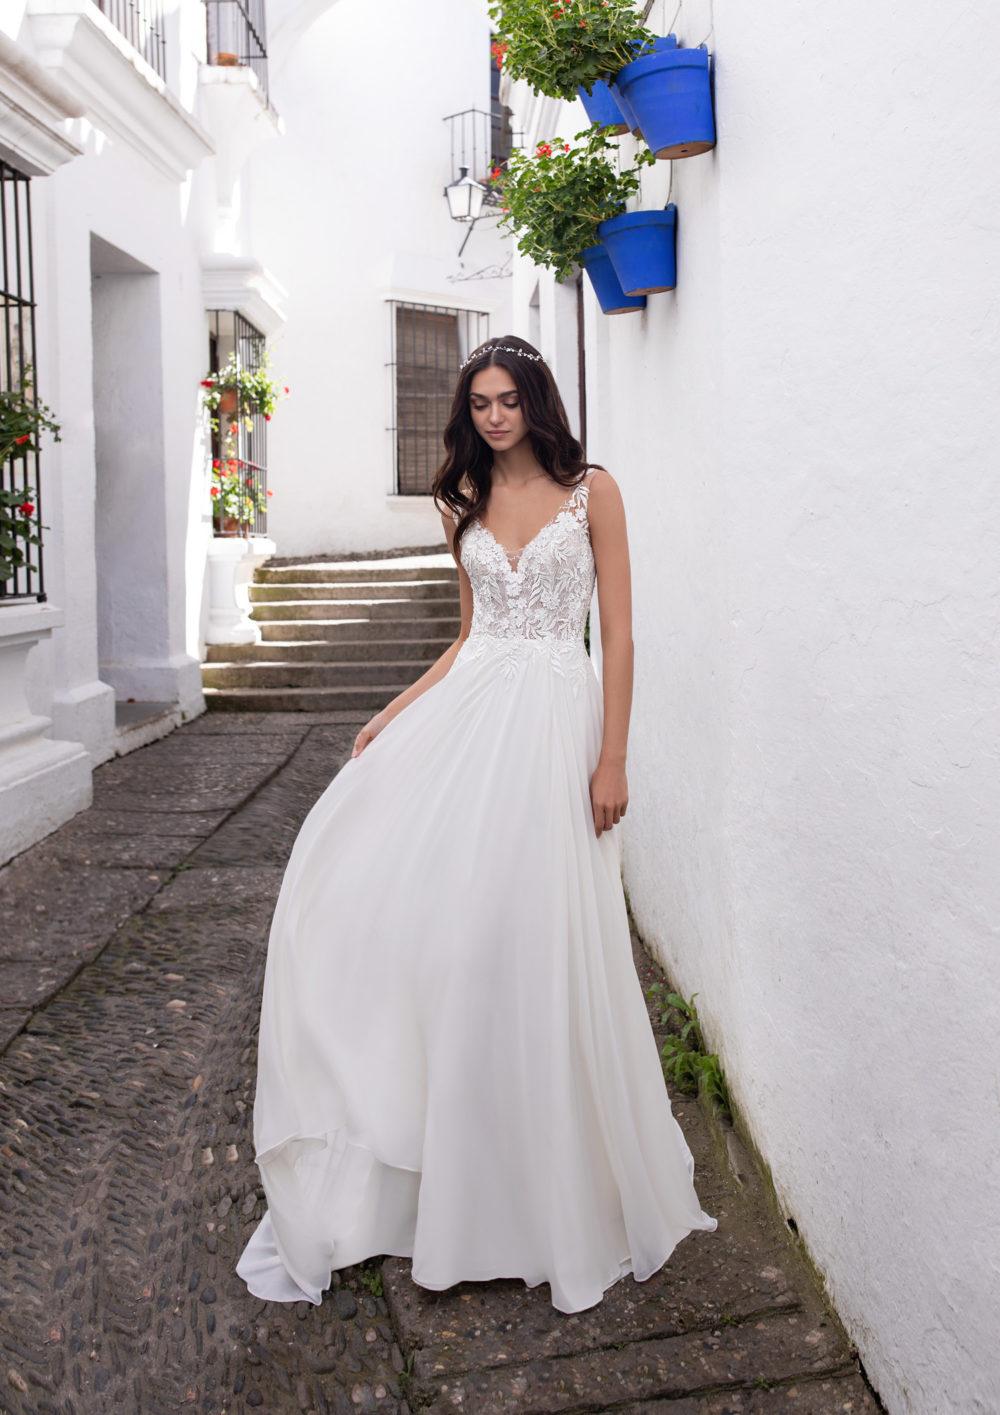 Mariages: abito da sposa Pronovias 2020 a Vicenza, Verona, Padova, Veneto ERIDANI